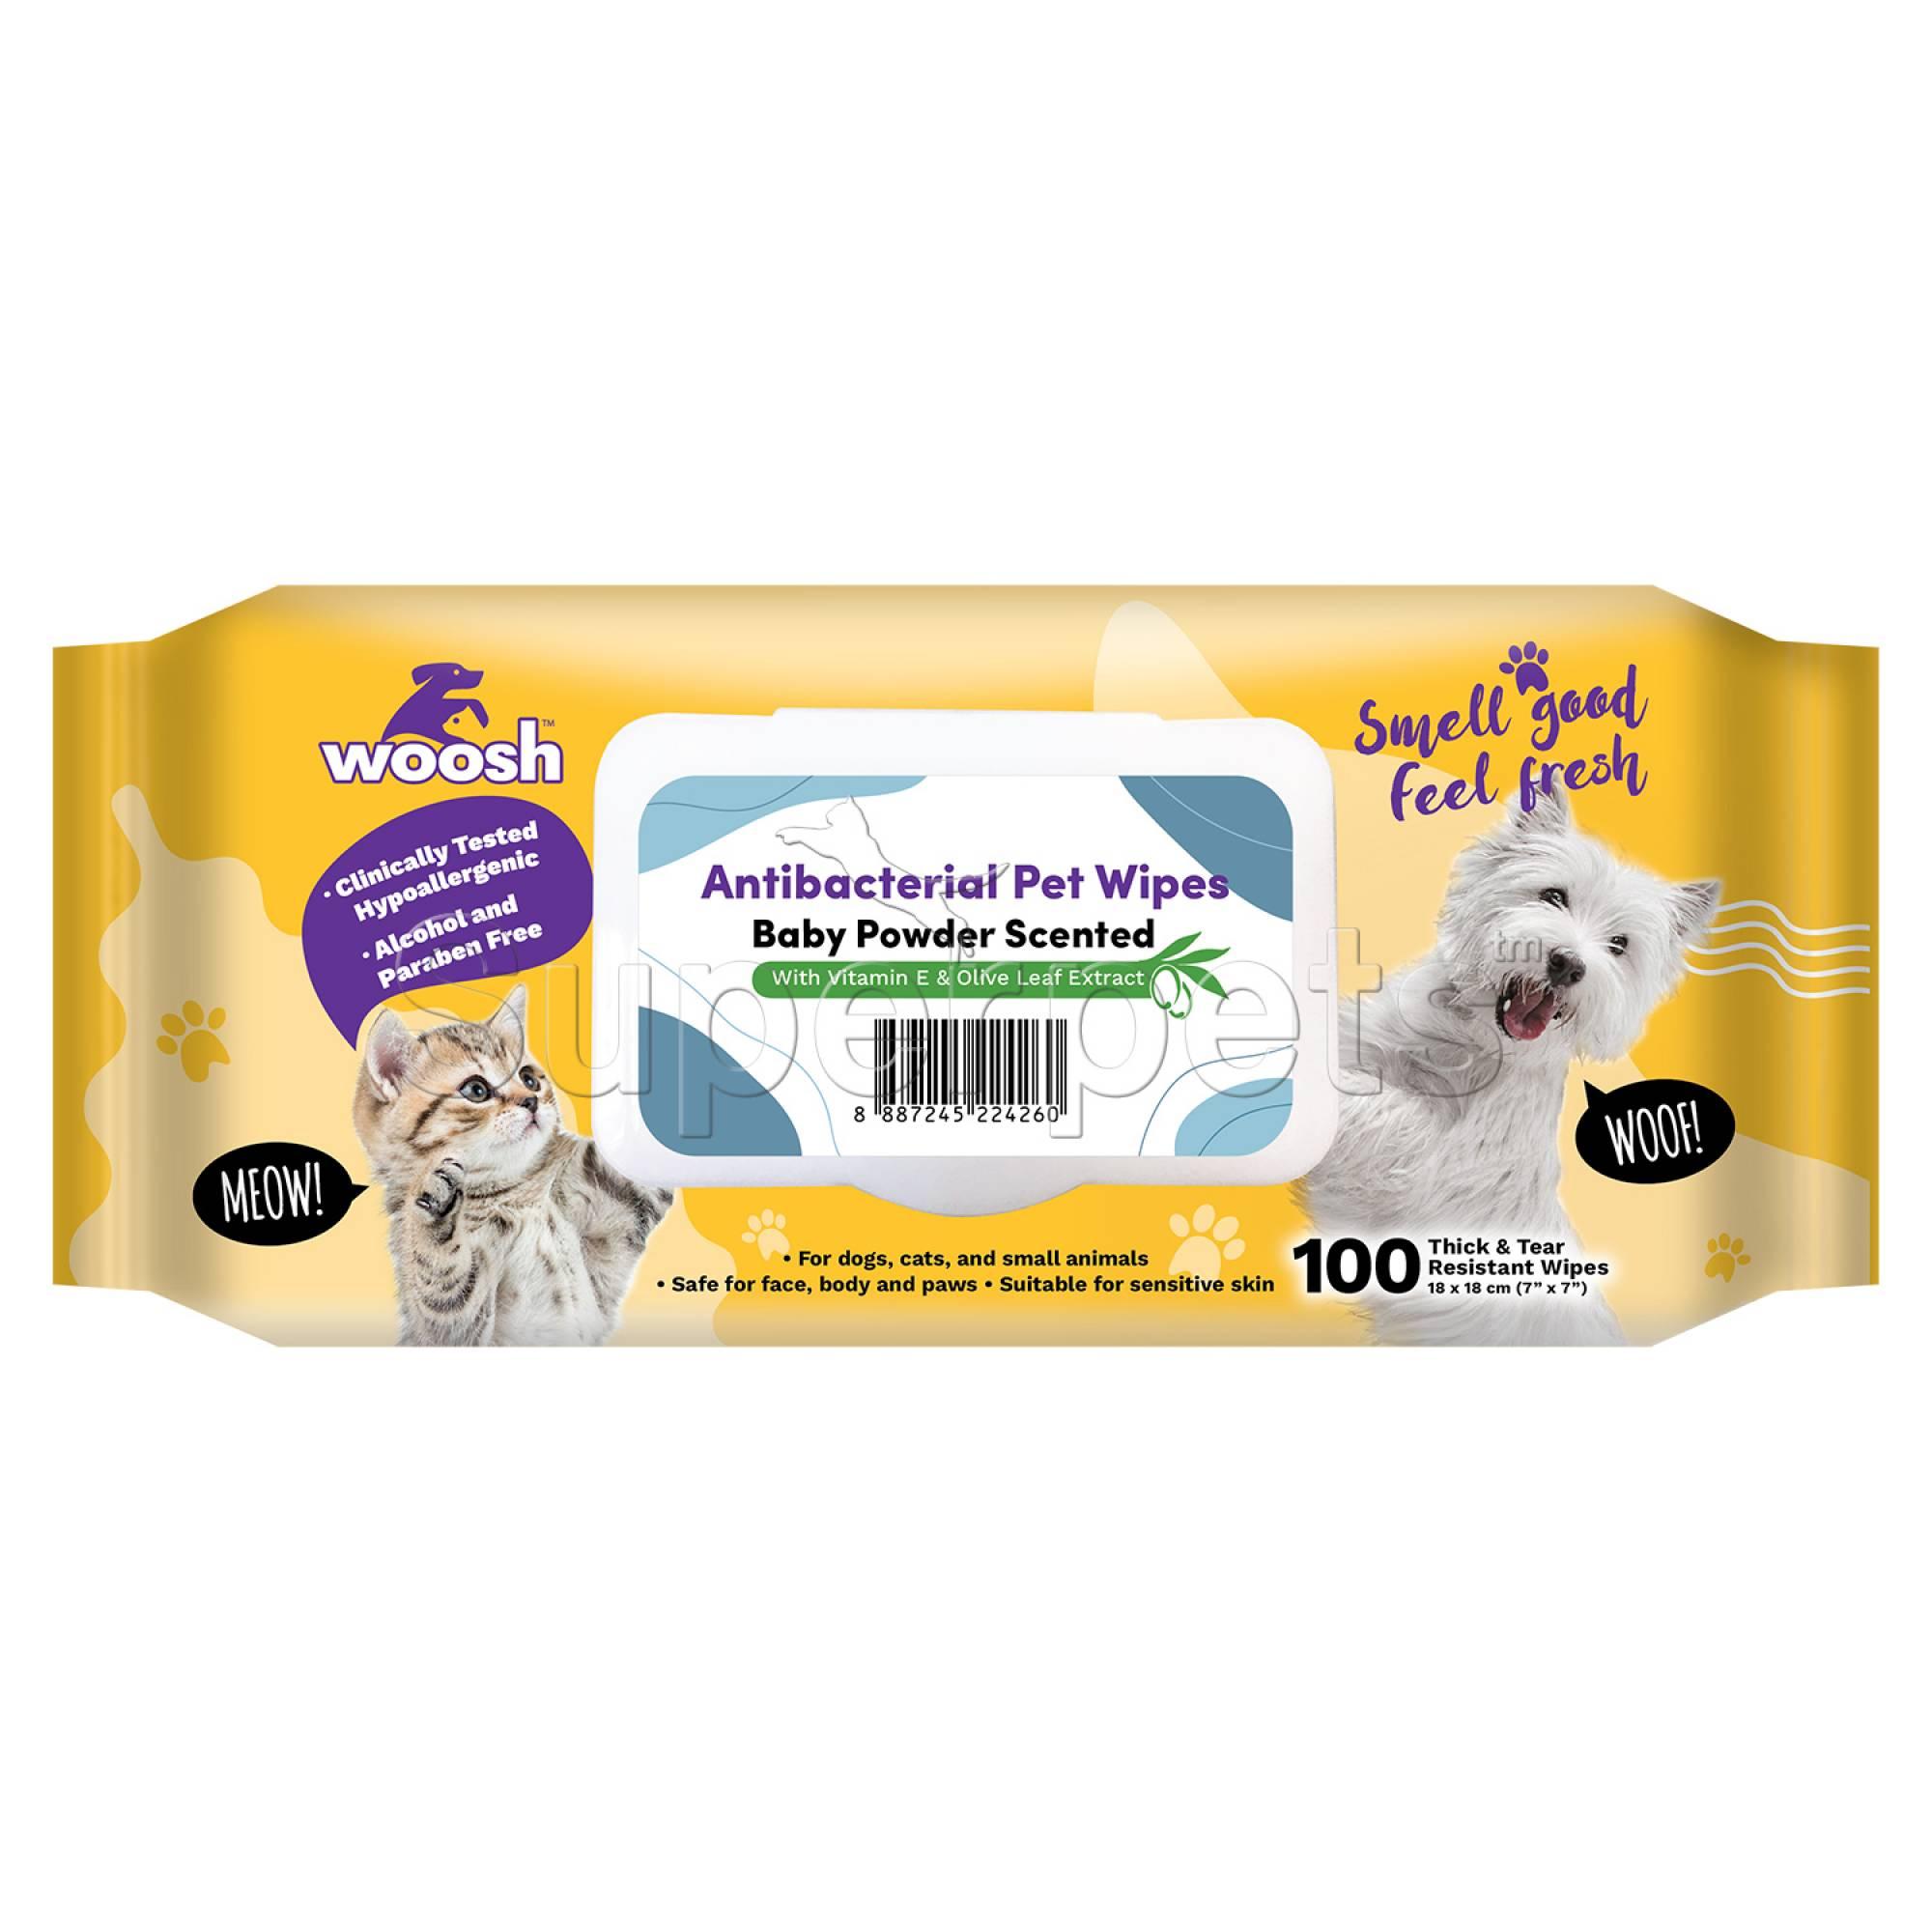 Woosh - Anti Bacterial Pet Wipes 100pcs (BabyPowder)